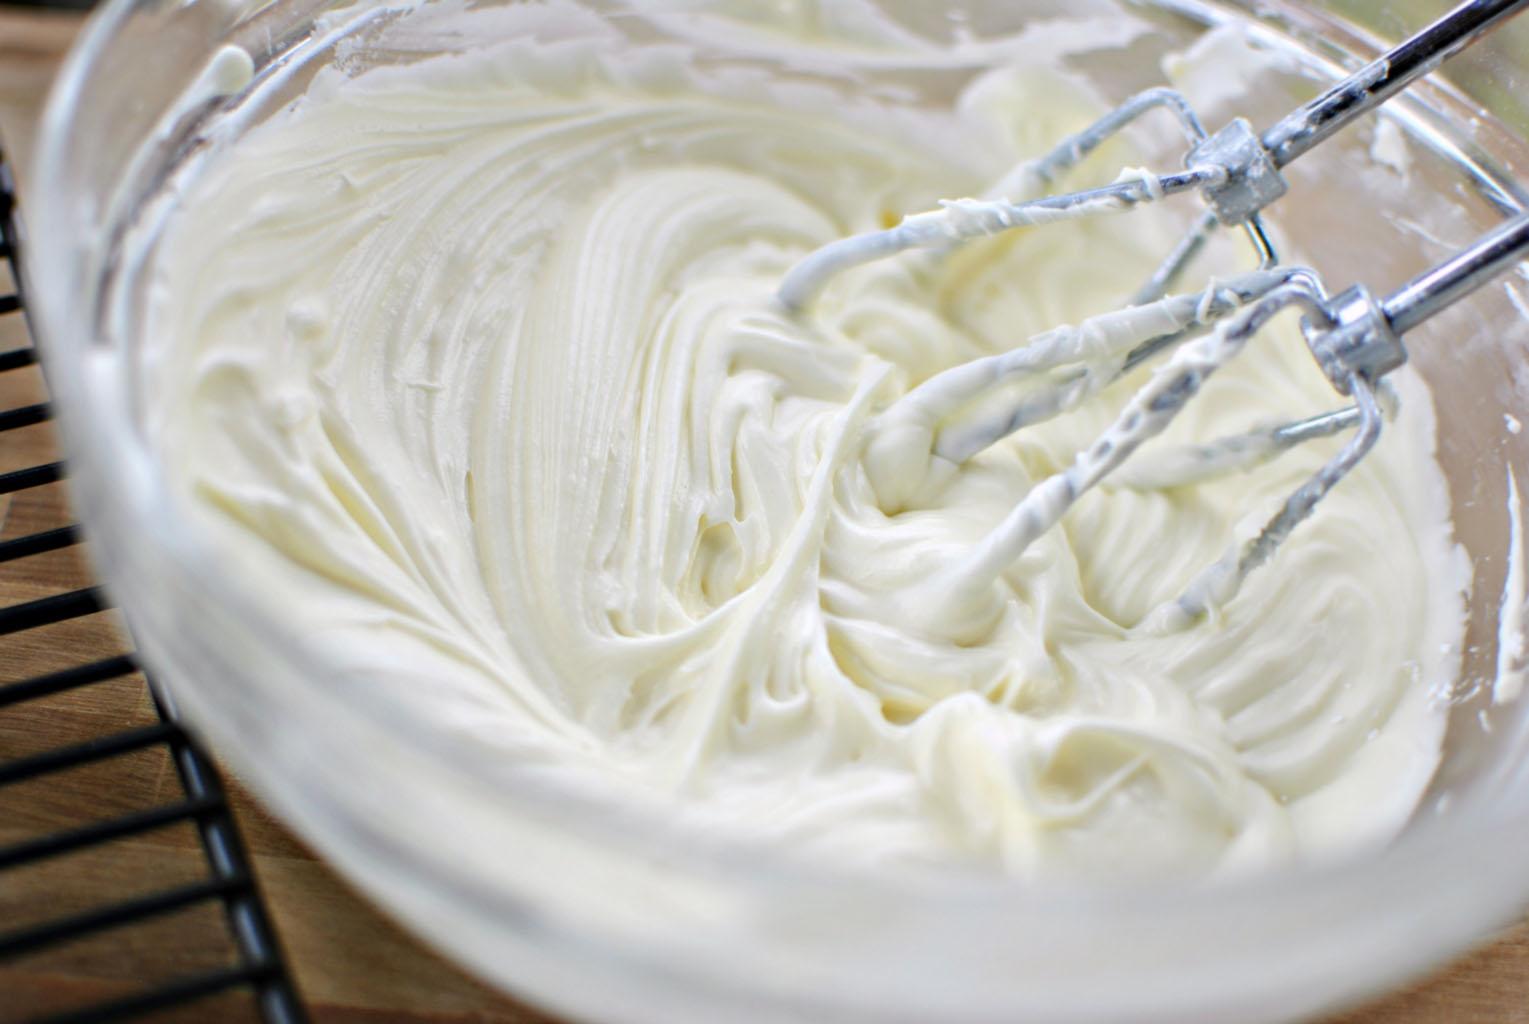 Взбить сливки с сахарной пудрой маскарпоне